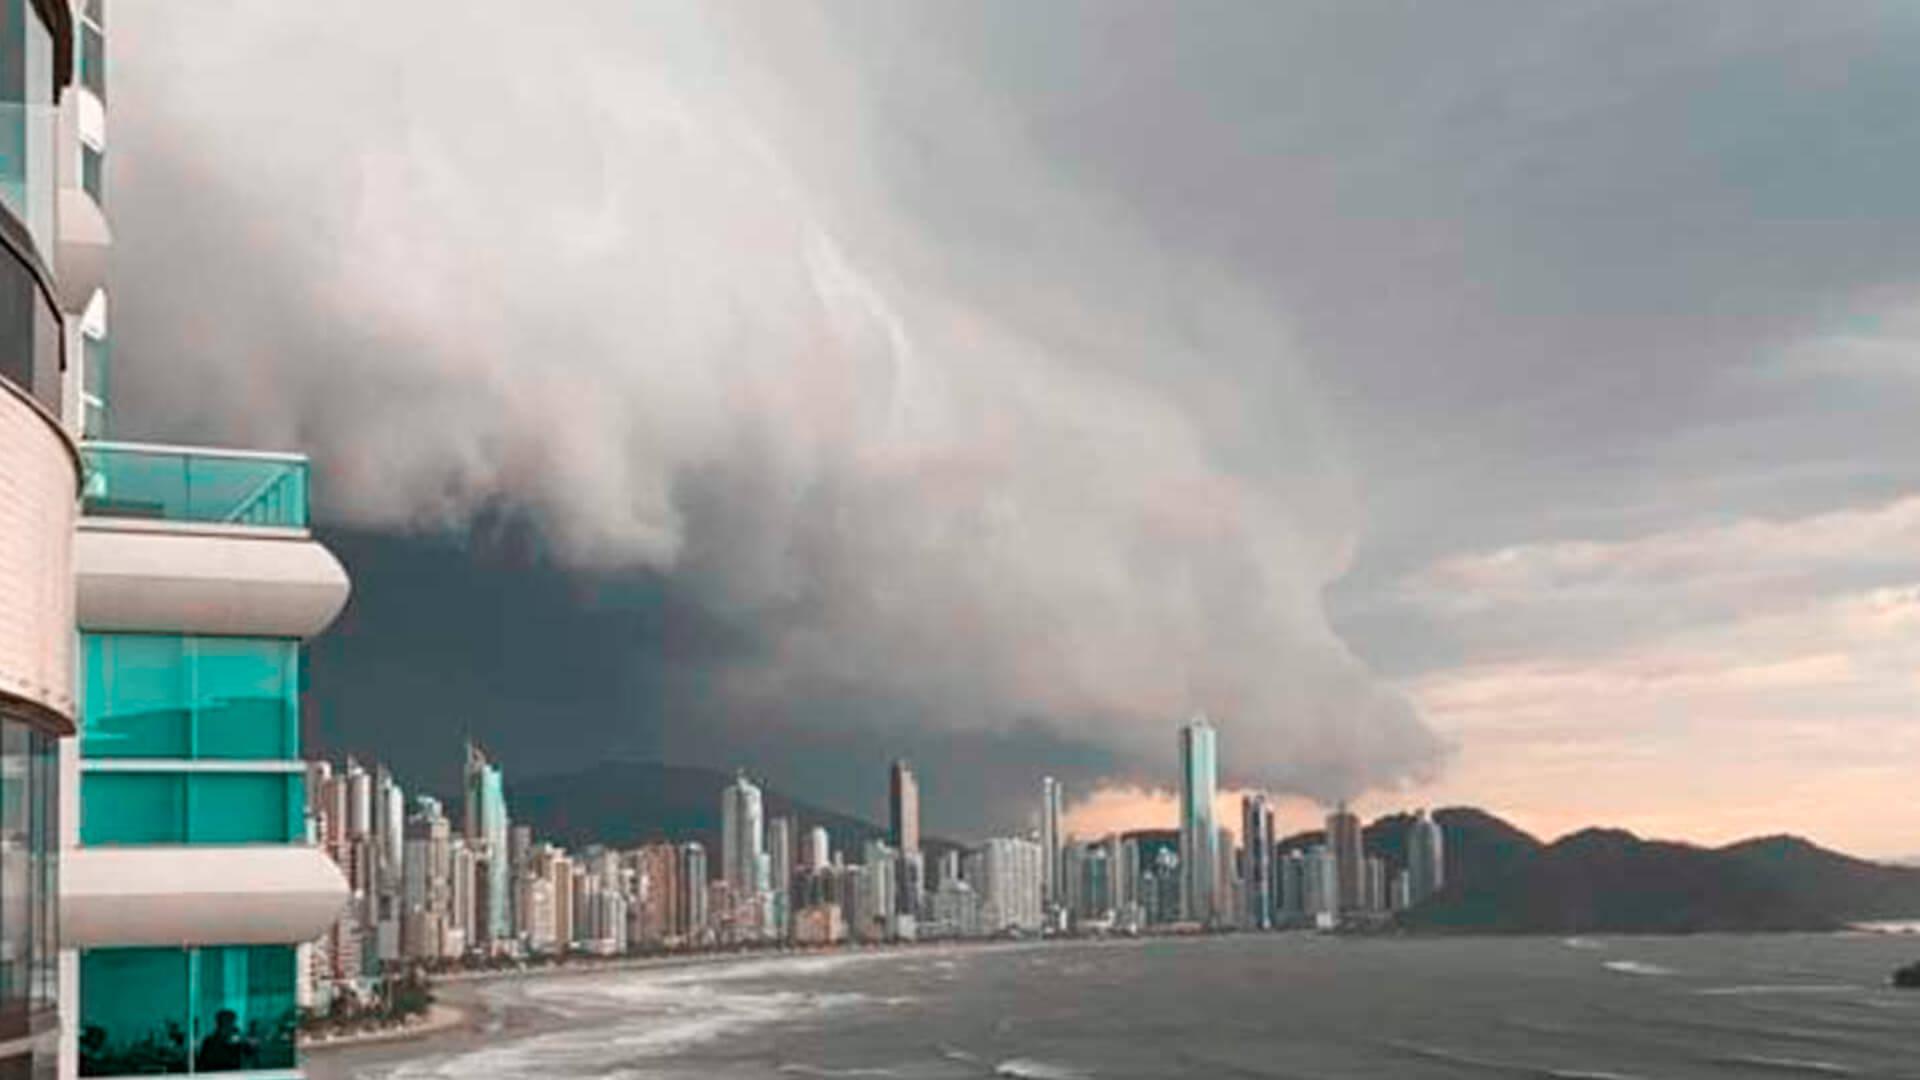 ciclone-bomba-extratropical-santa-catarina-sc-brasil